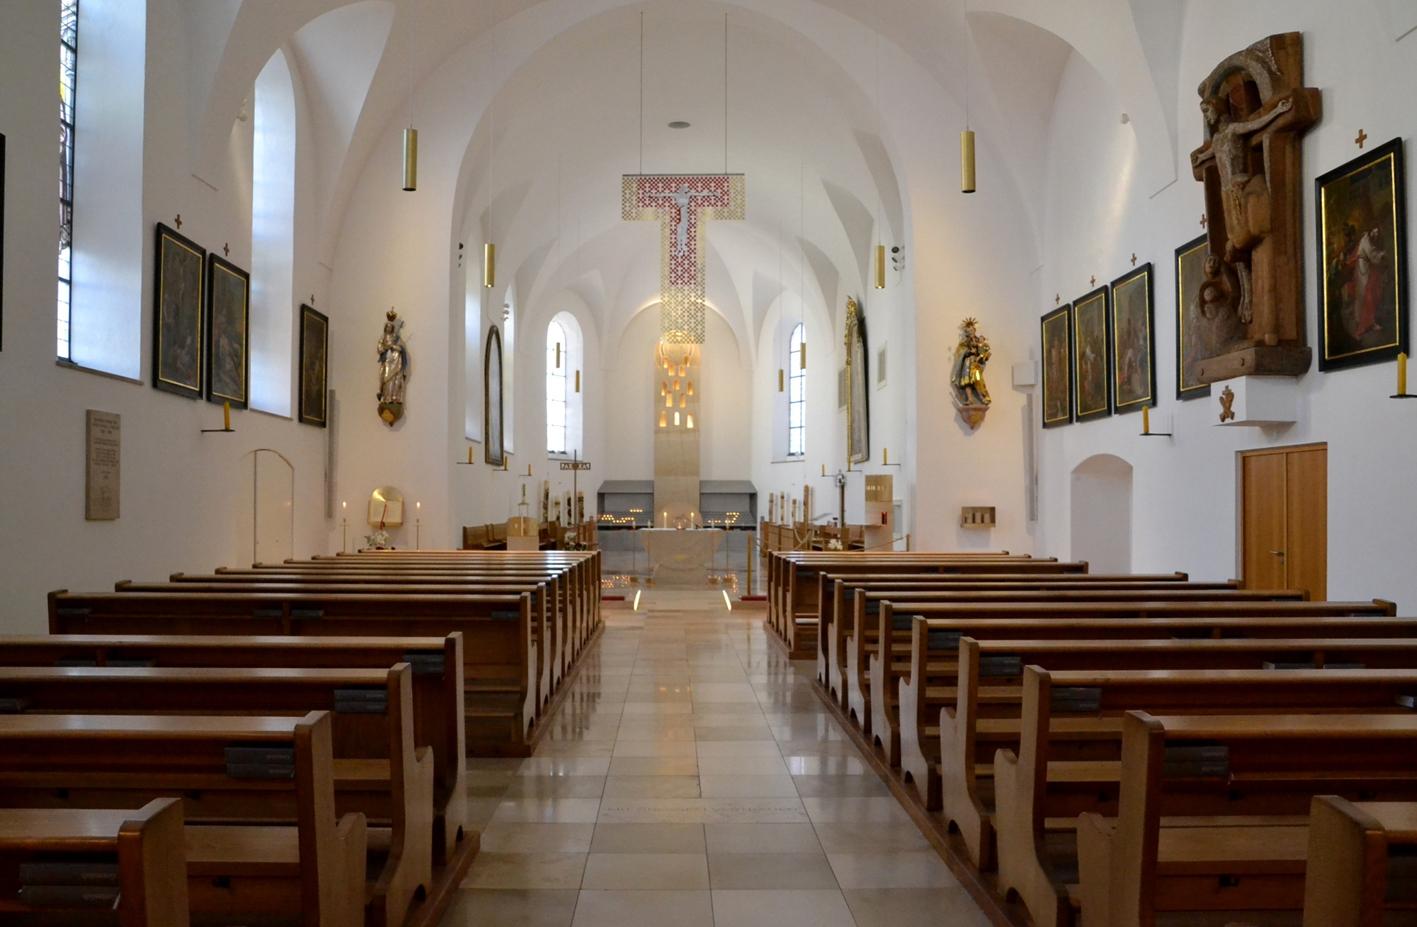 2020 06 22 aoelfb stkonradkirche altoetting